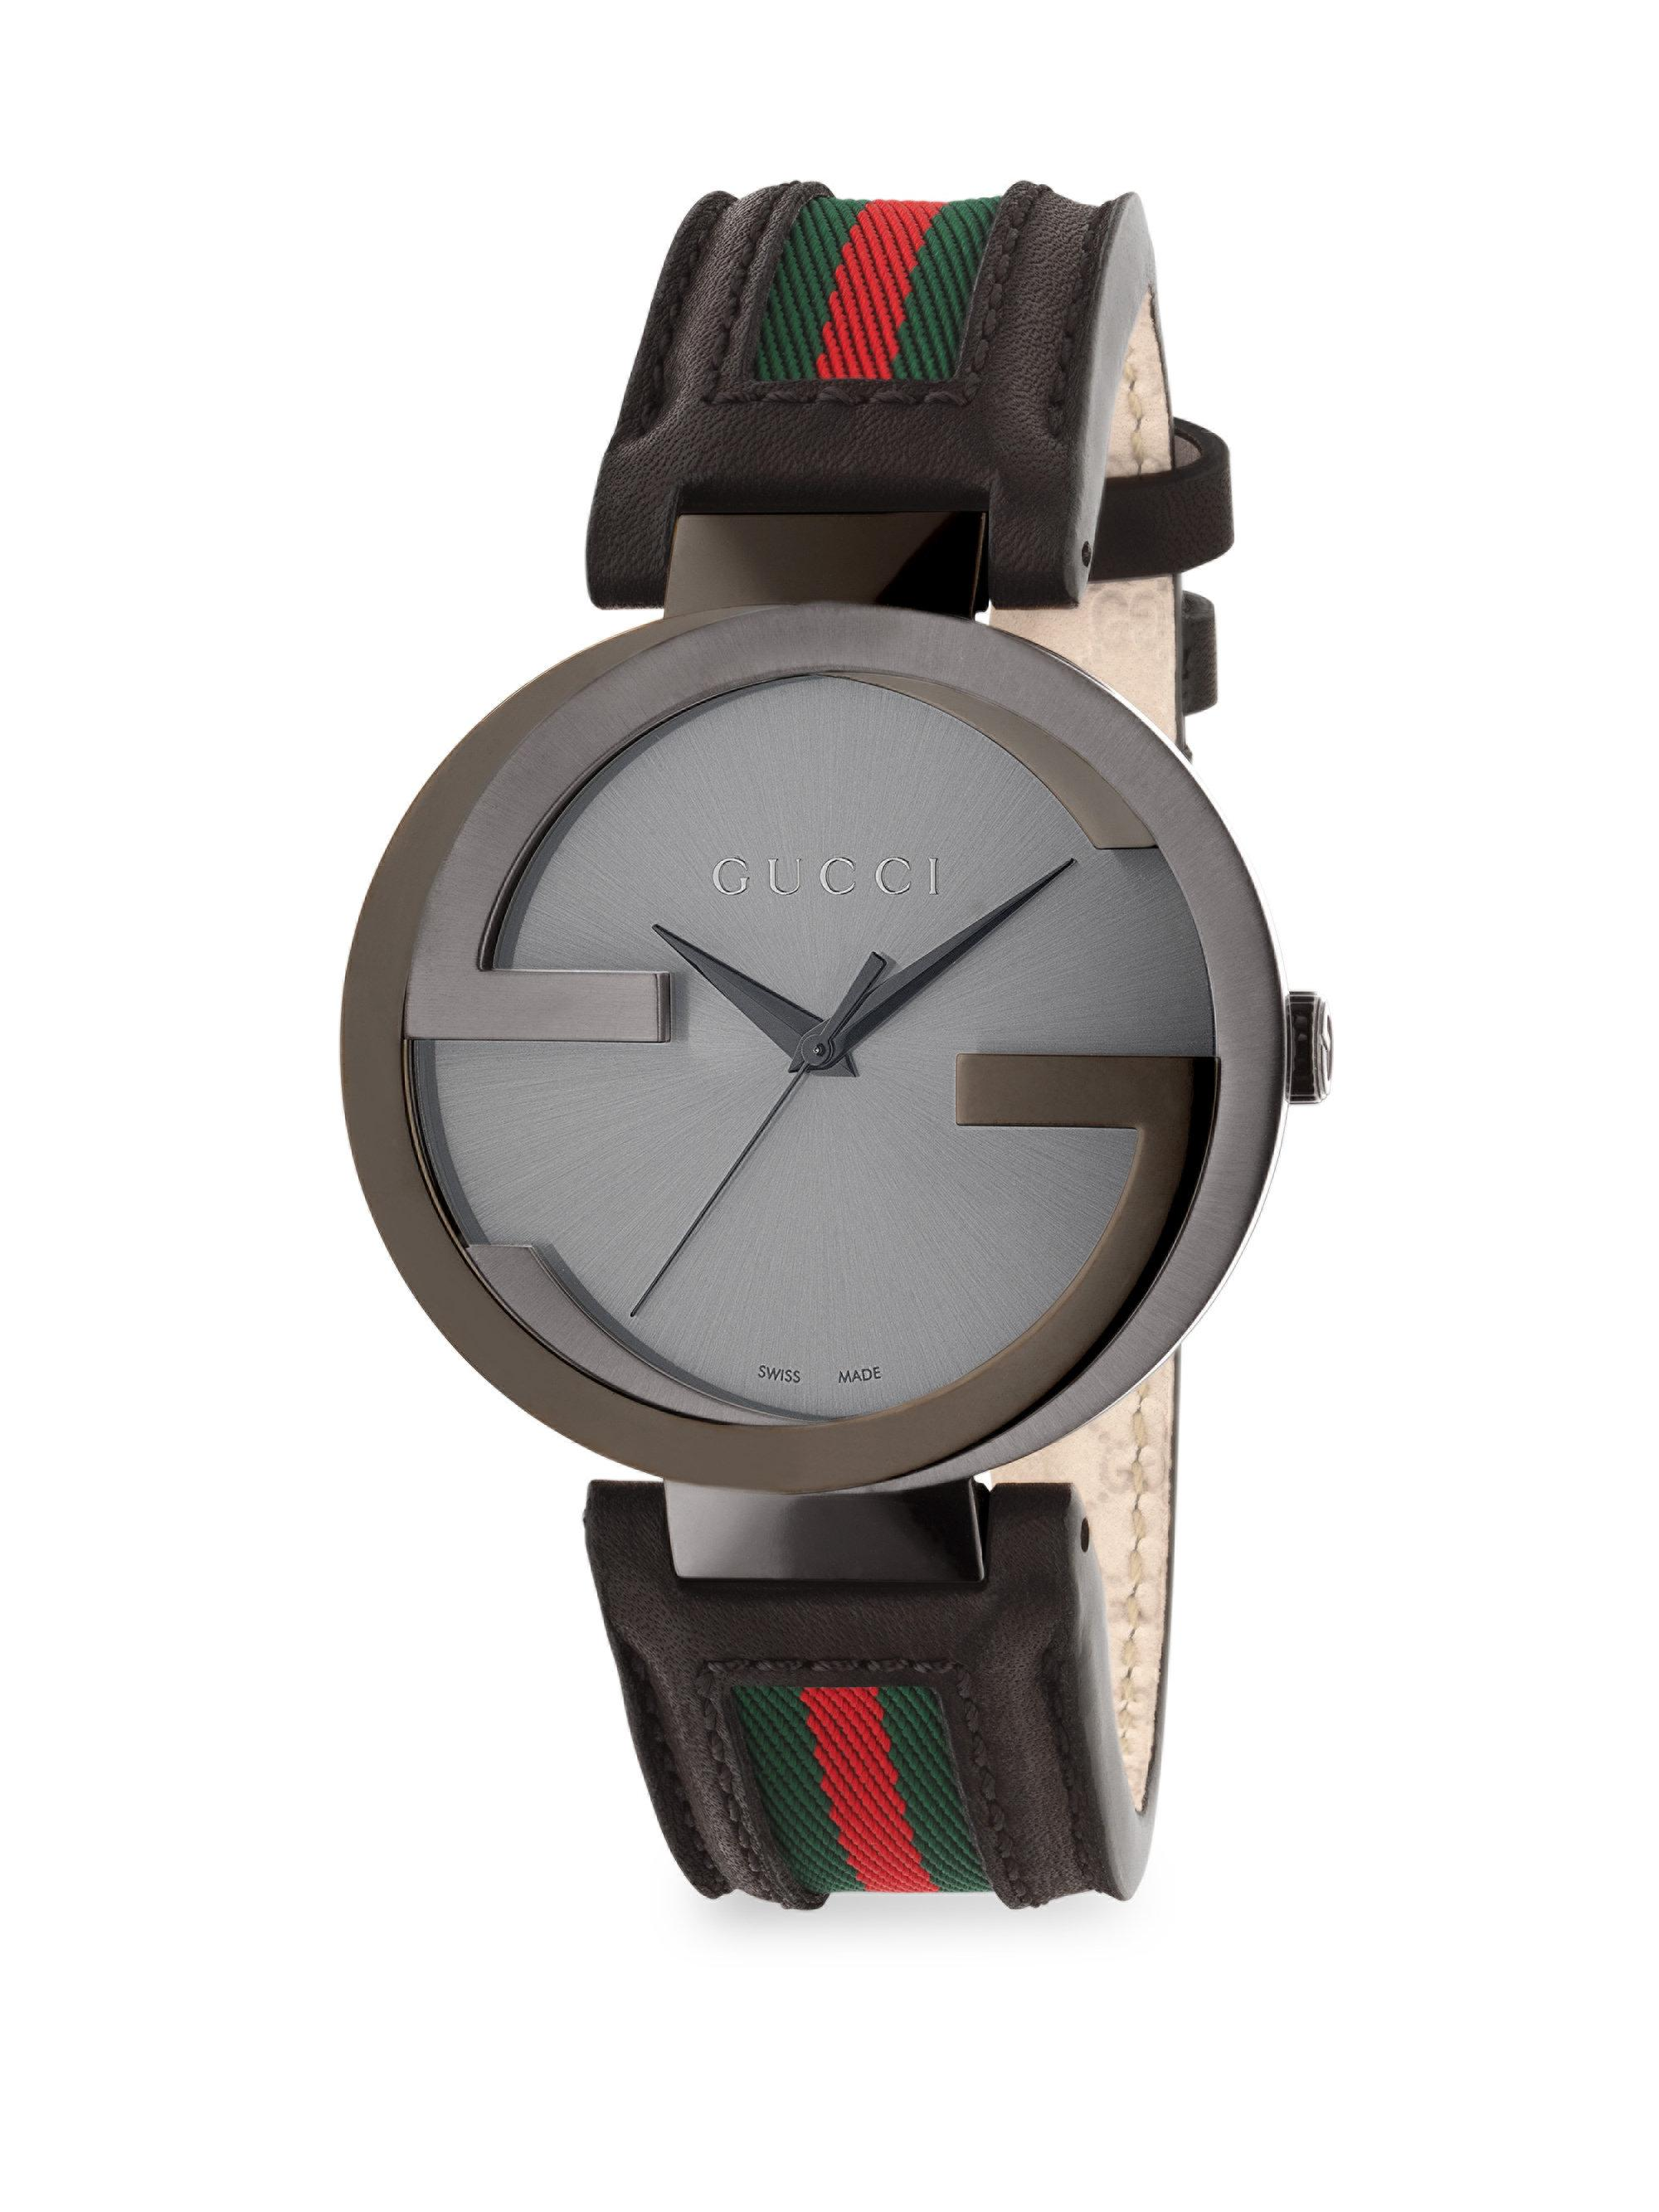 089de84c0e4 Gucci Watch